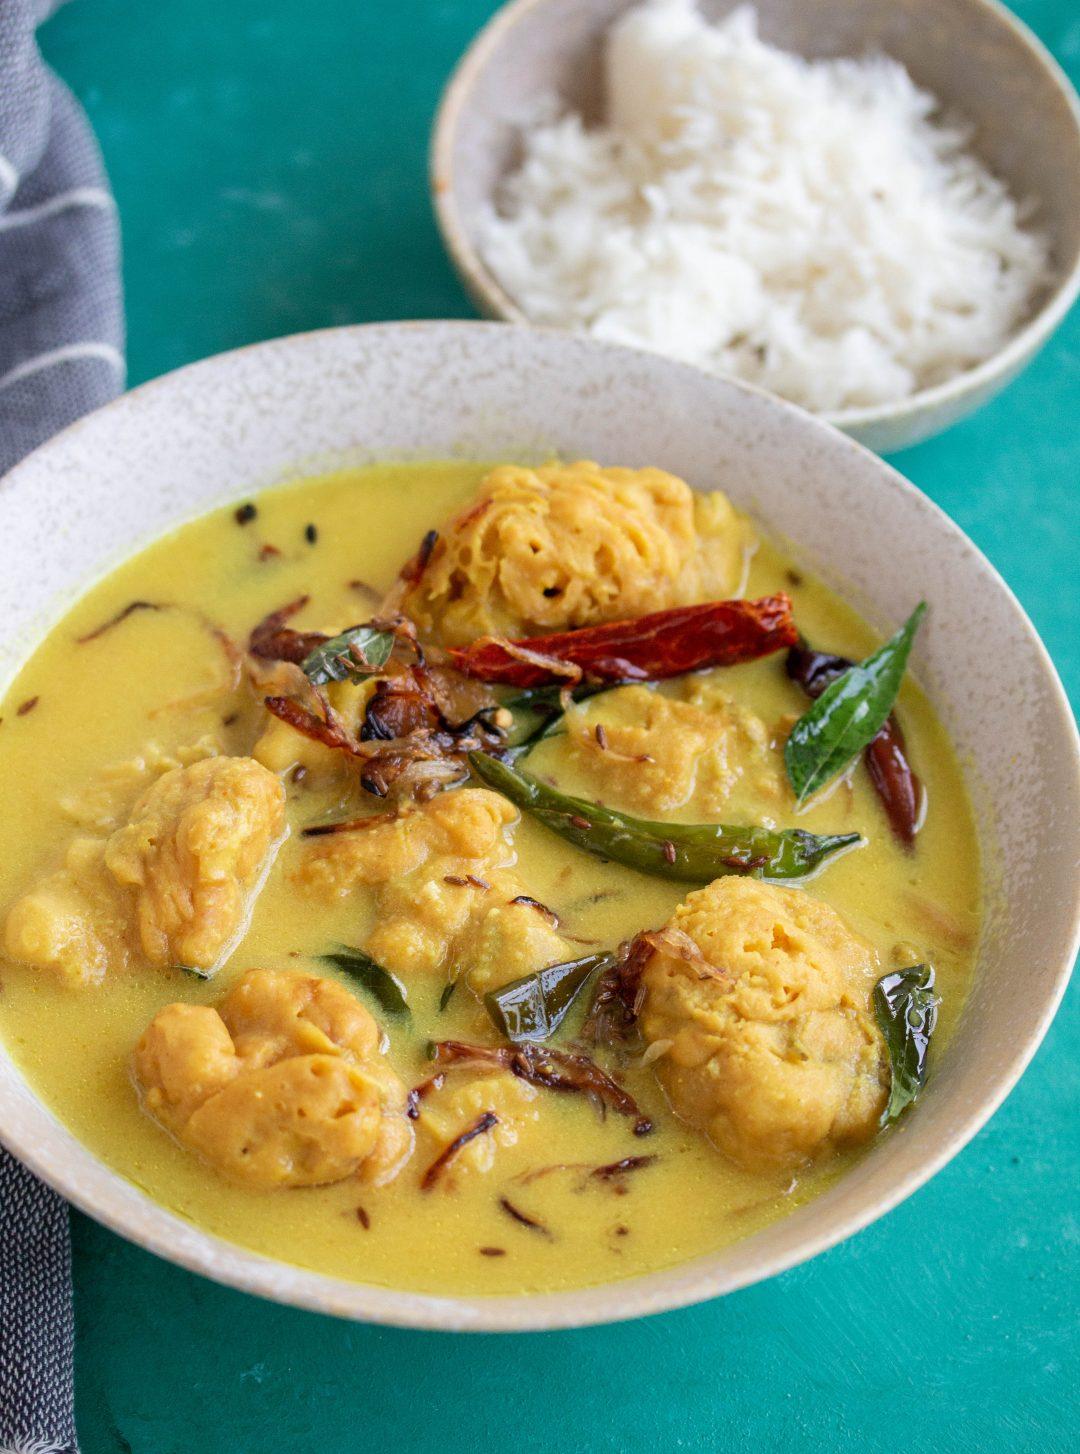 Karhi or Karhi Pakora is a Pakistani vegetarian dish consisting of a sour yoghurt & chickpea flour/besan base with pakora's or vegetable fritters.